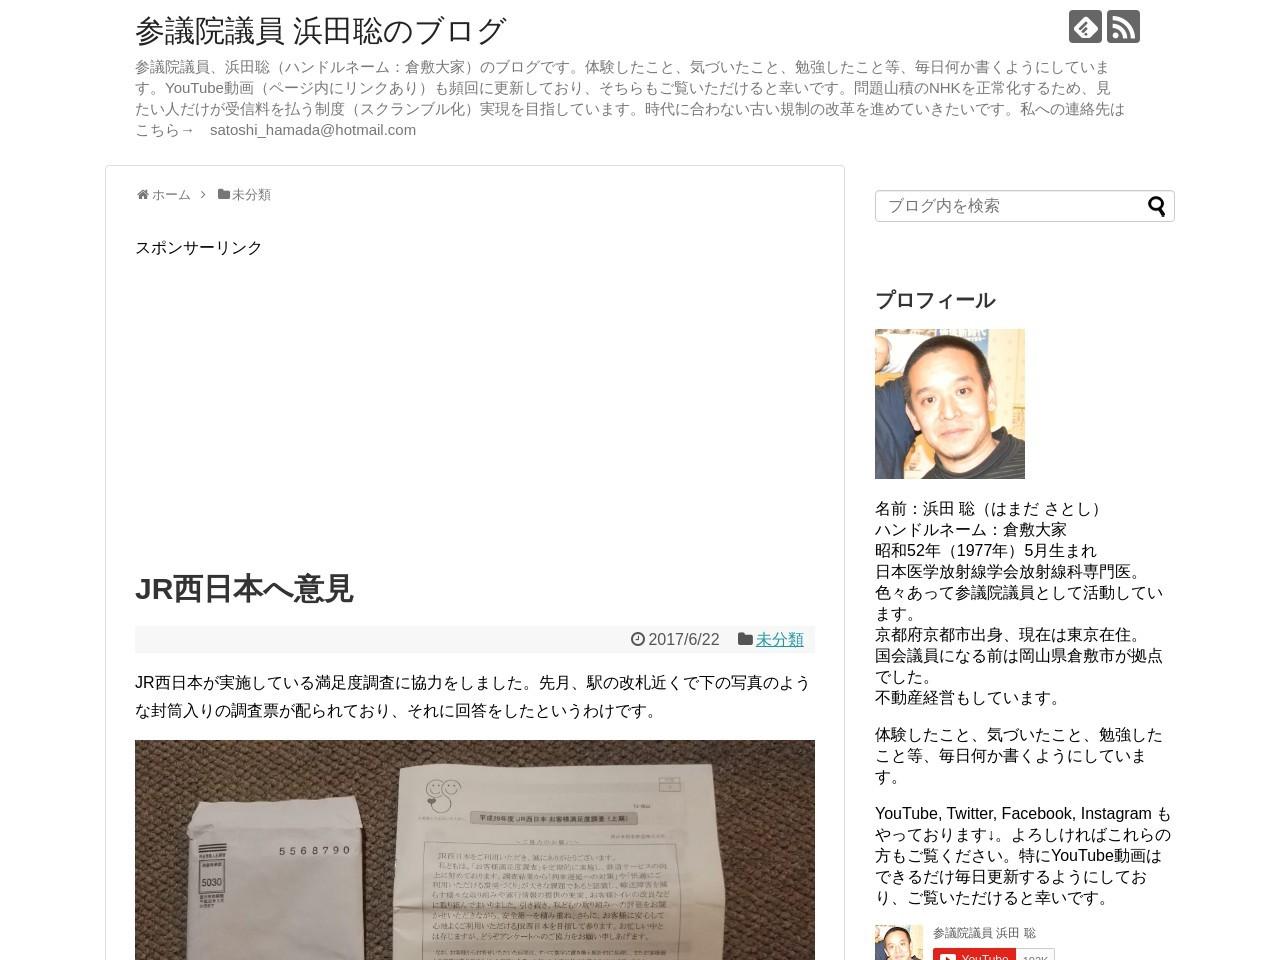 JR西日本へ意見